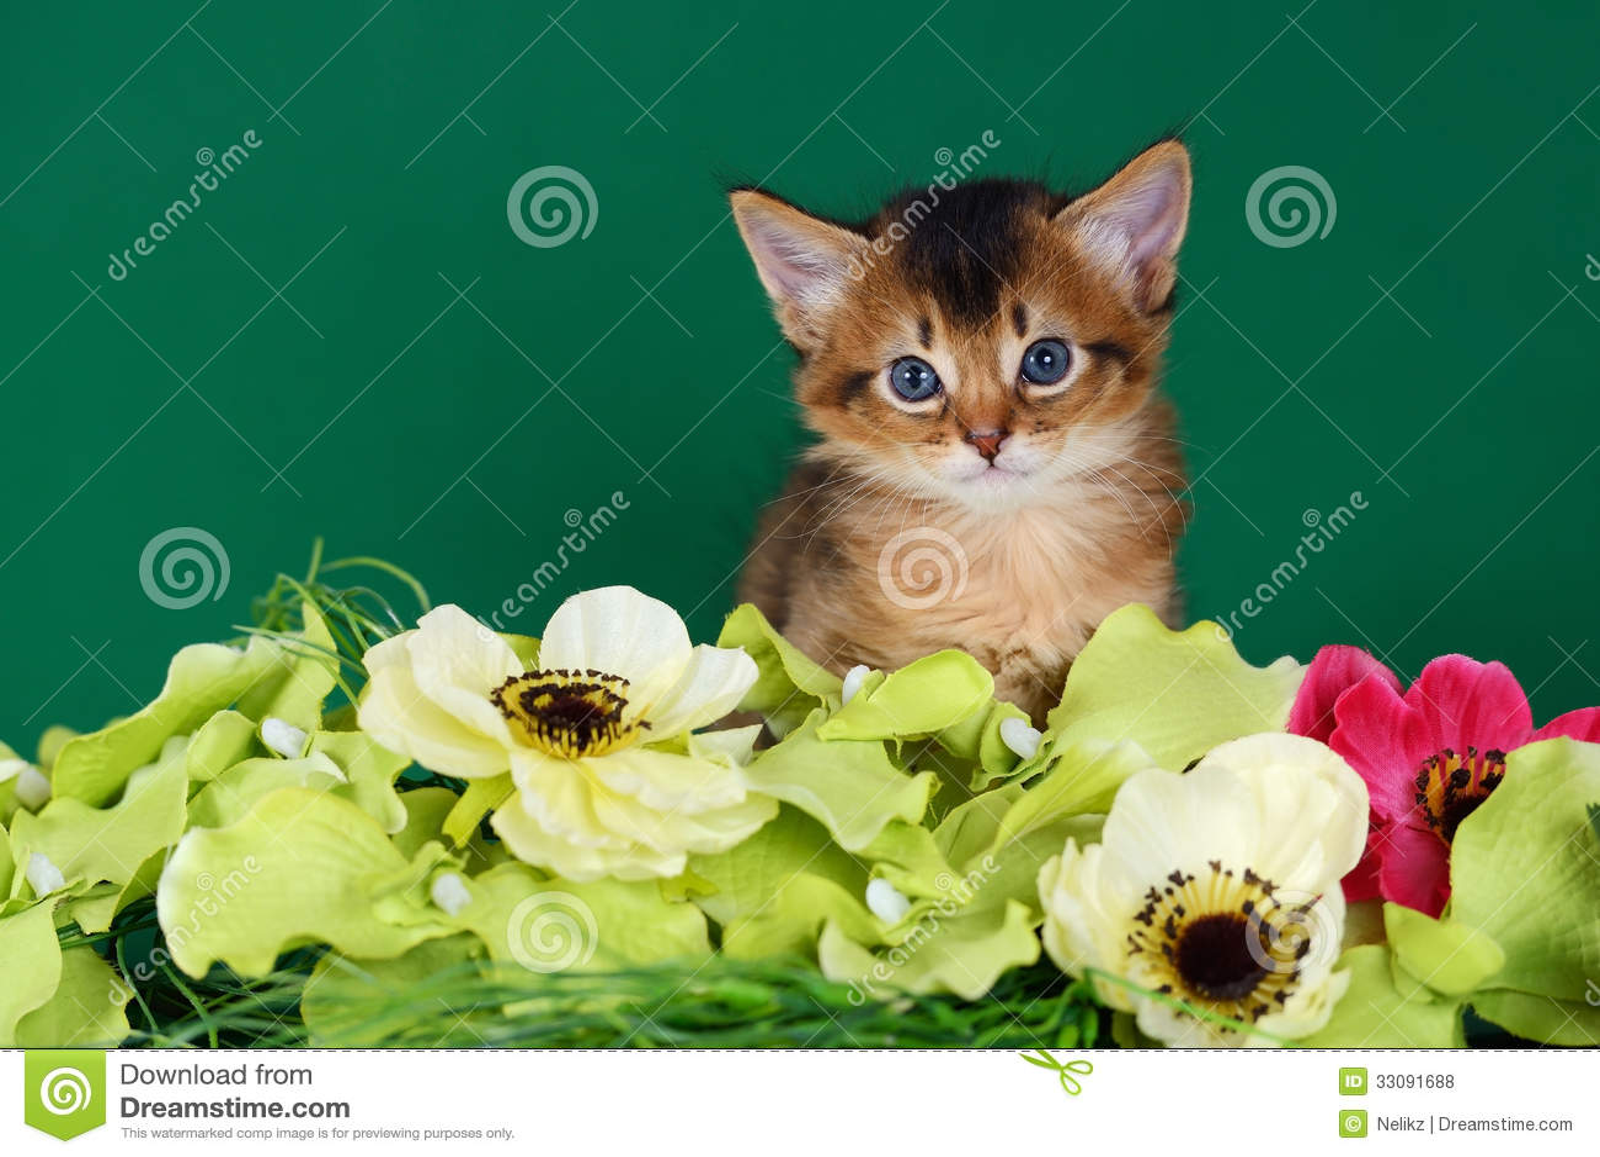 Leuk Somalisch katje op de groene achtergrond